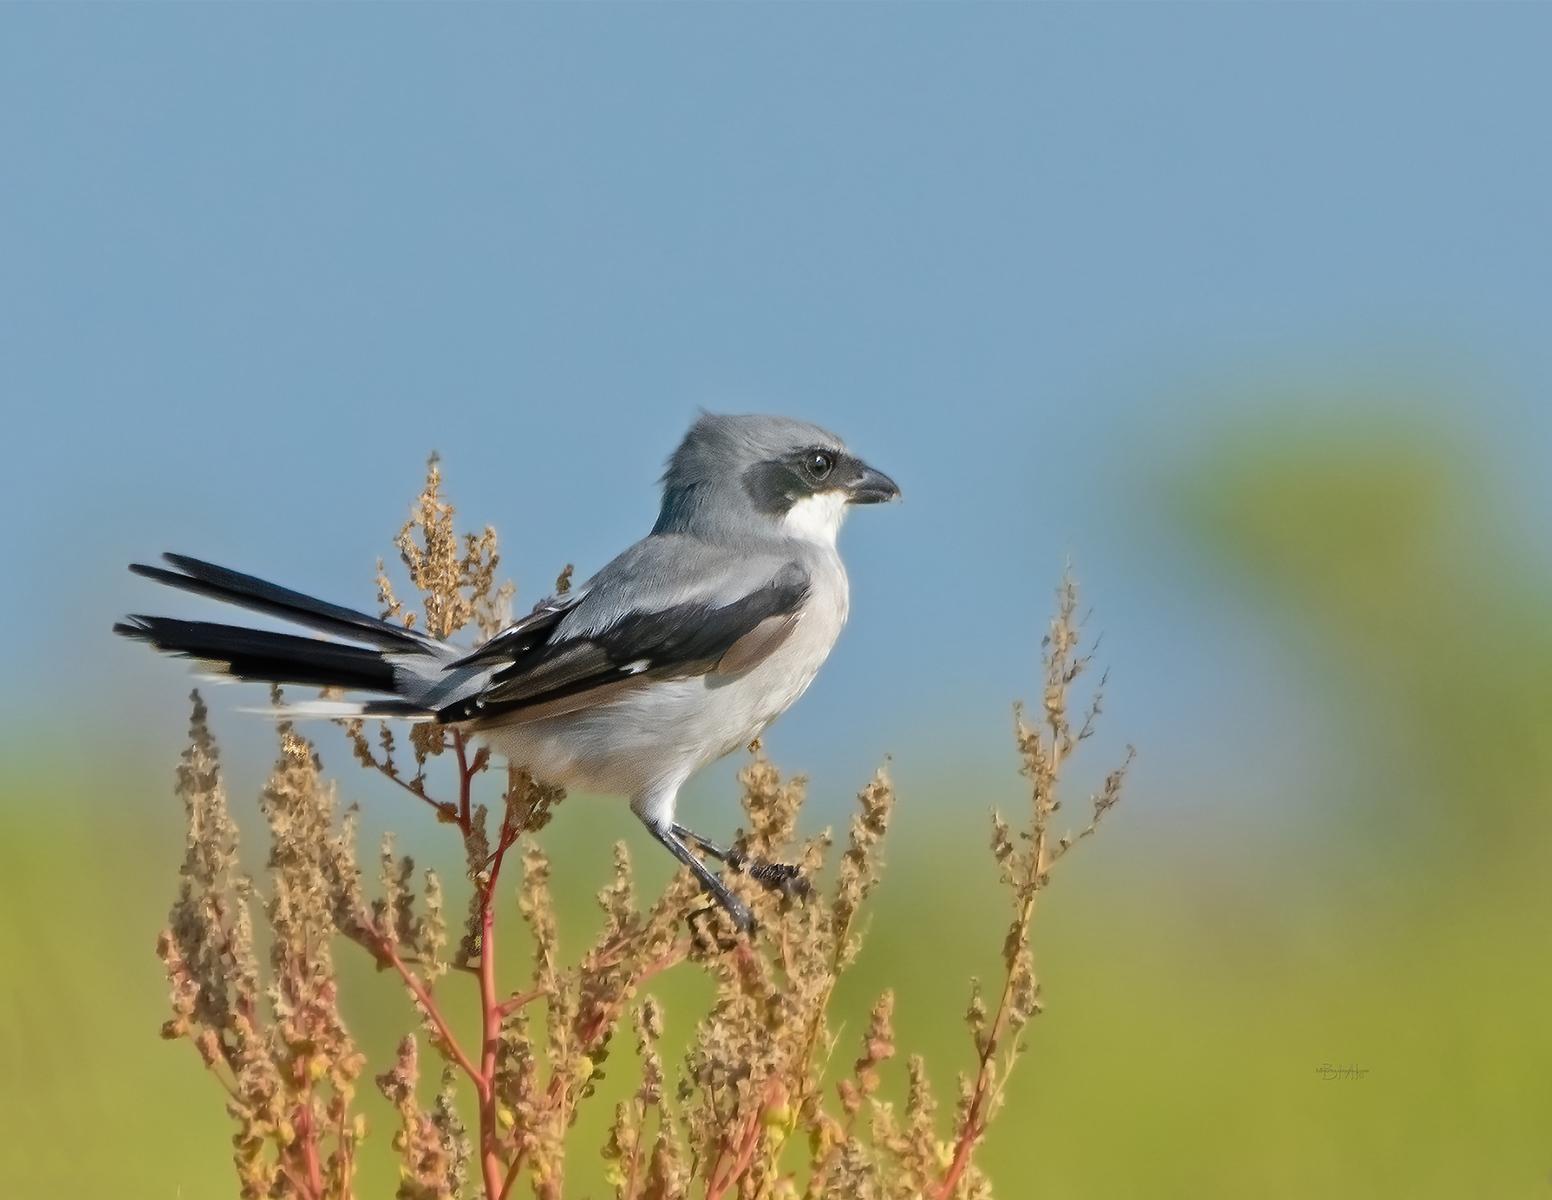 IMAGE: https://photos.smugmug.com/Private/n-XQ9MPw/Birds/Birds/i-9wrVLzX/0/aa99214b/X3/Loggerhead%20shrike%2010-1-19-9%20RS%206-2021-X3.jpg